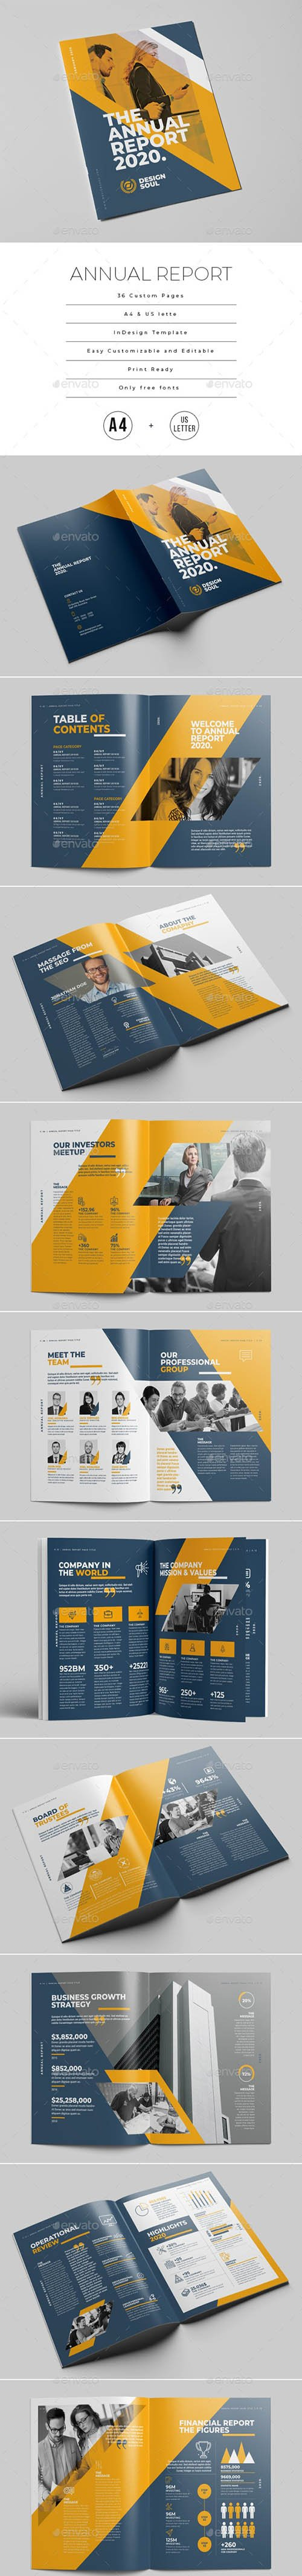 Annual Report Template 25379514